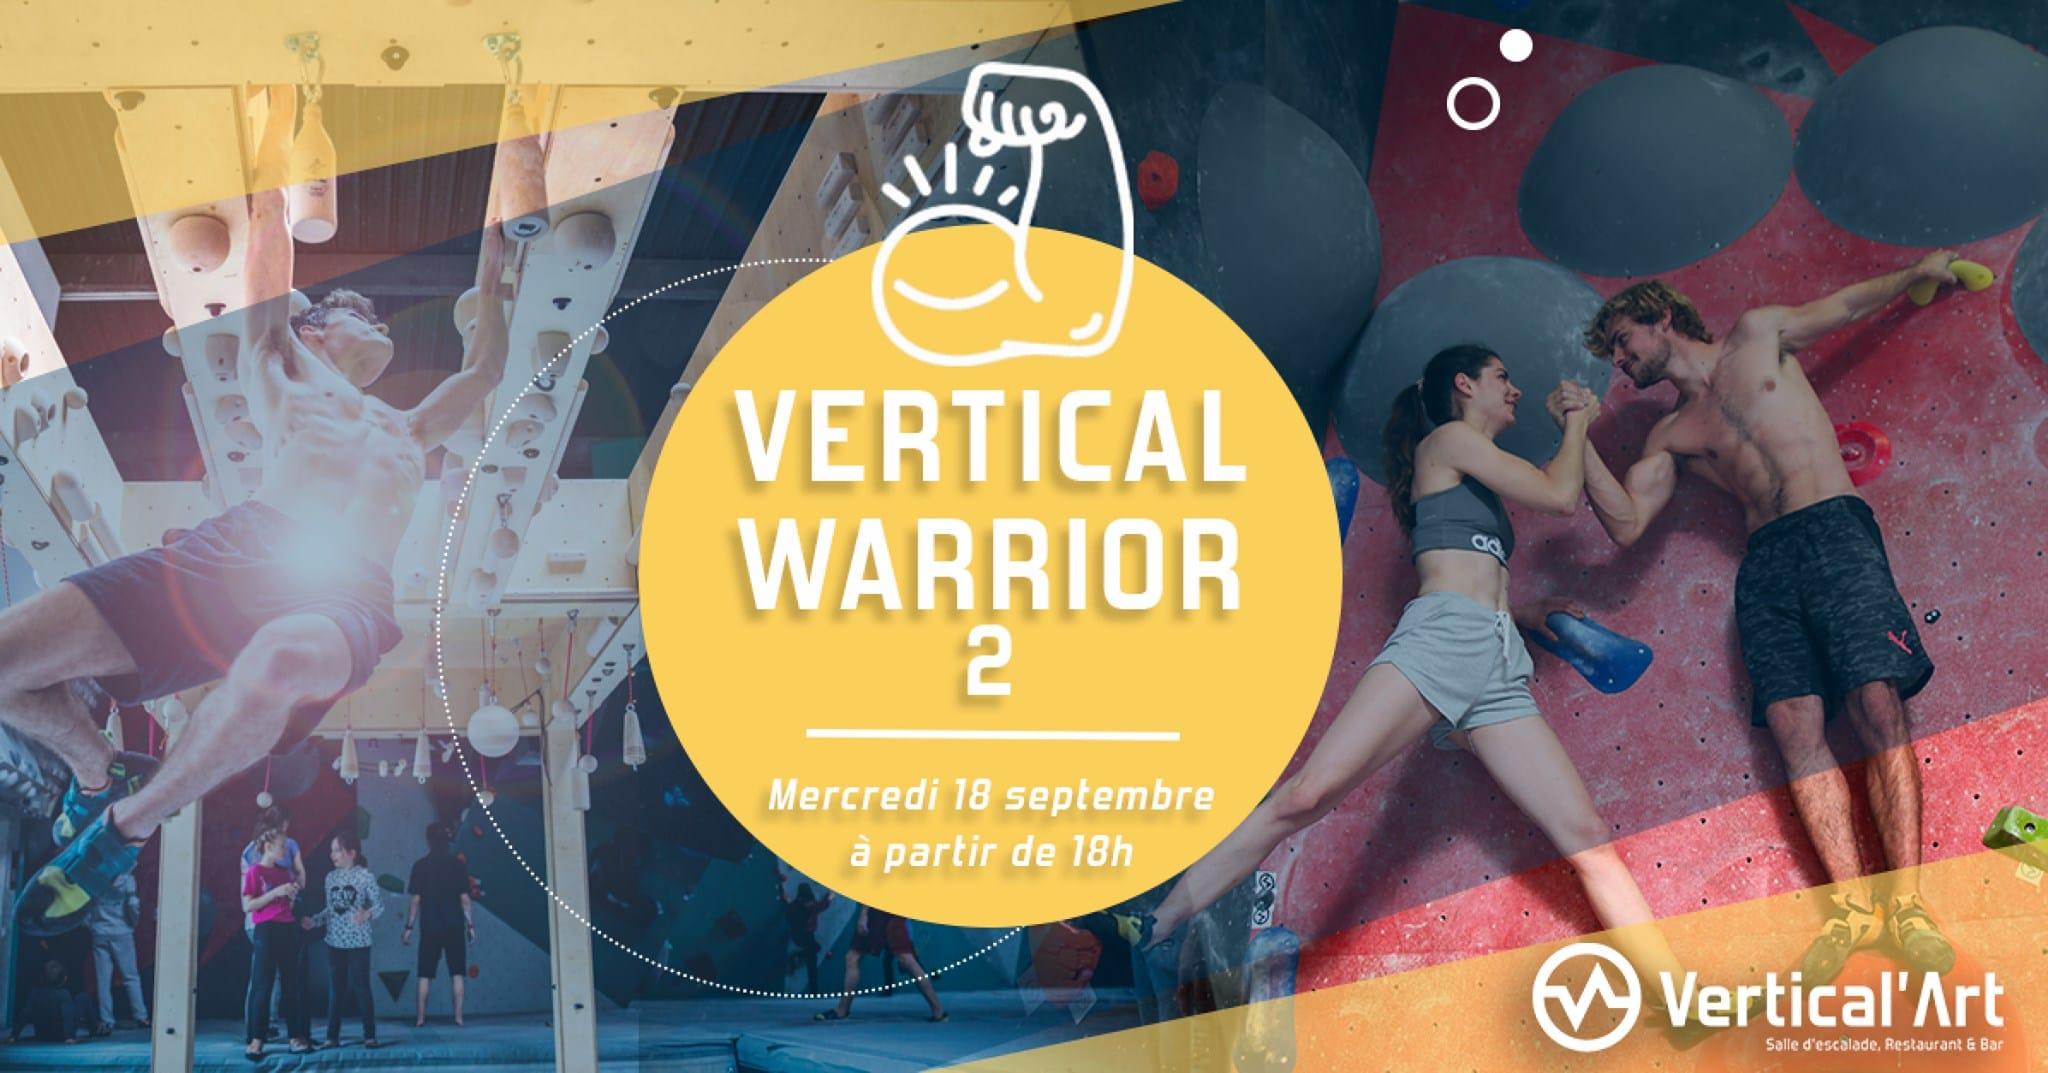 verticalWarrior 2 - contest - semaine - salle d'escalade restaurant bar